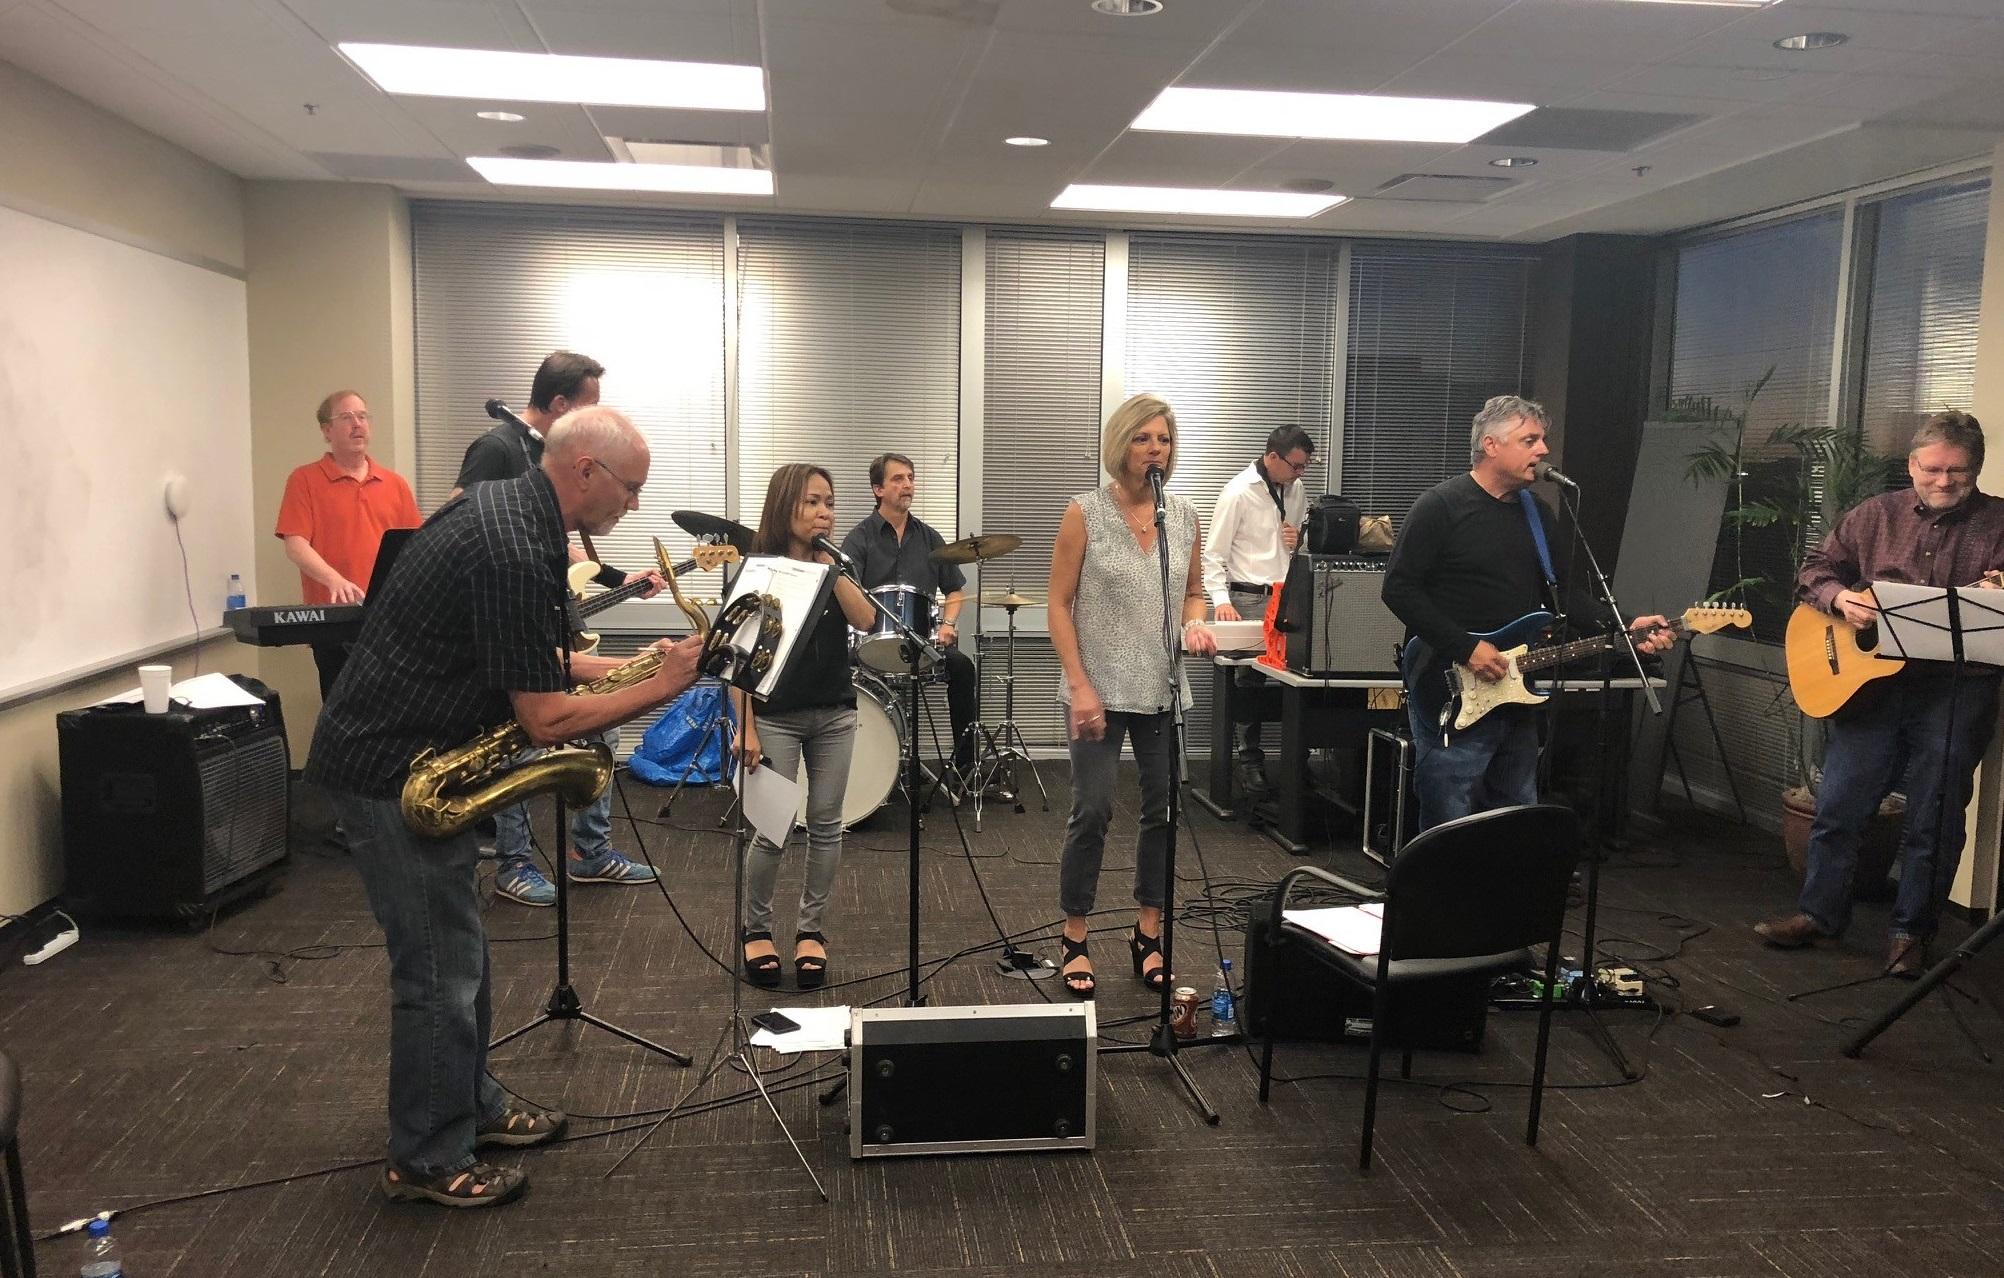 Axway rock band